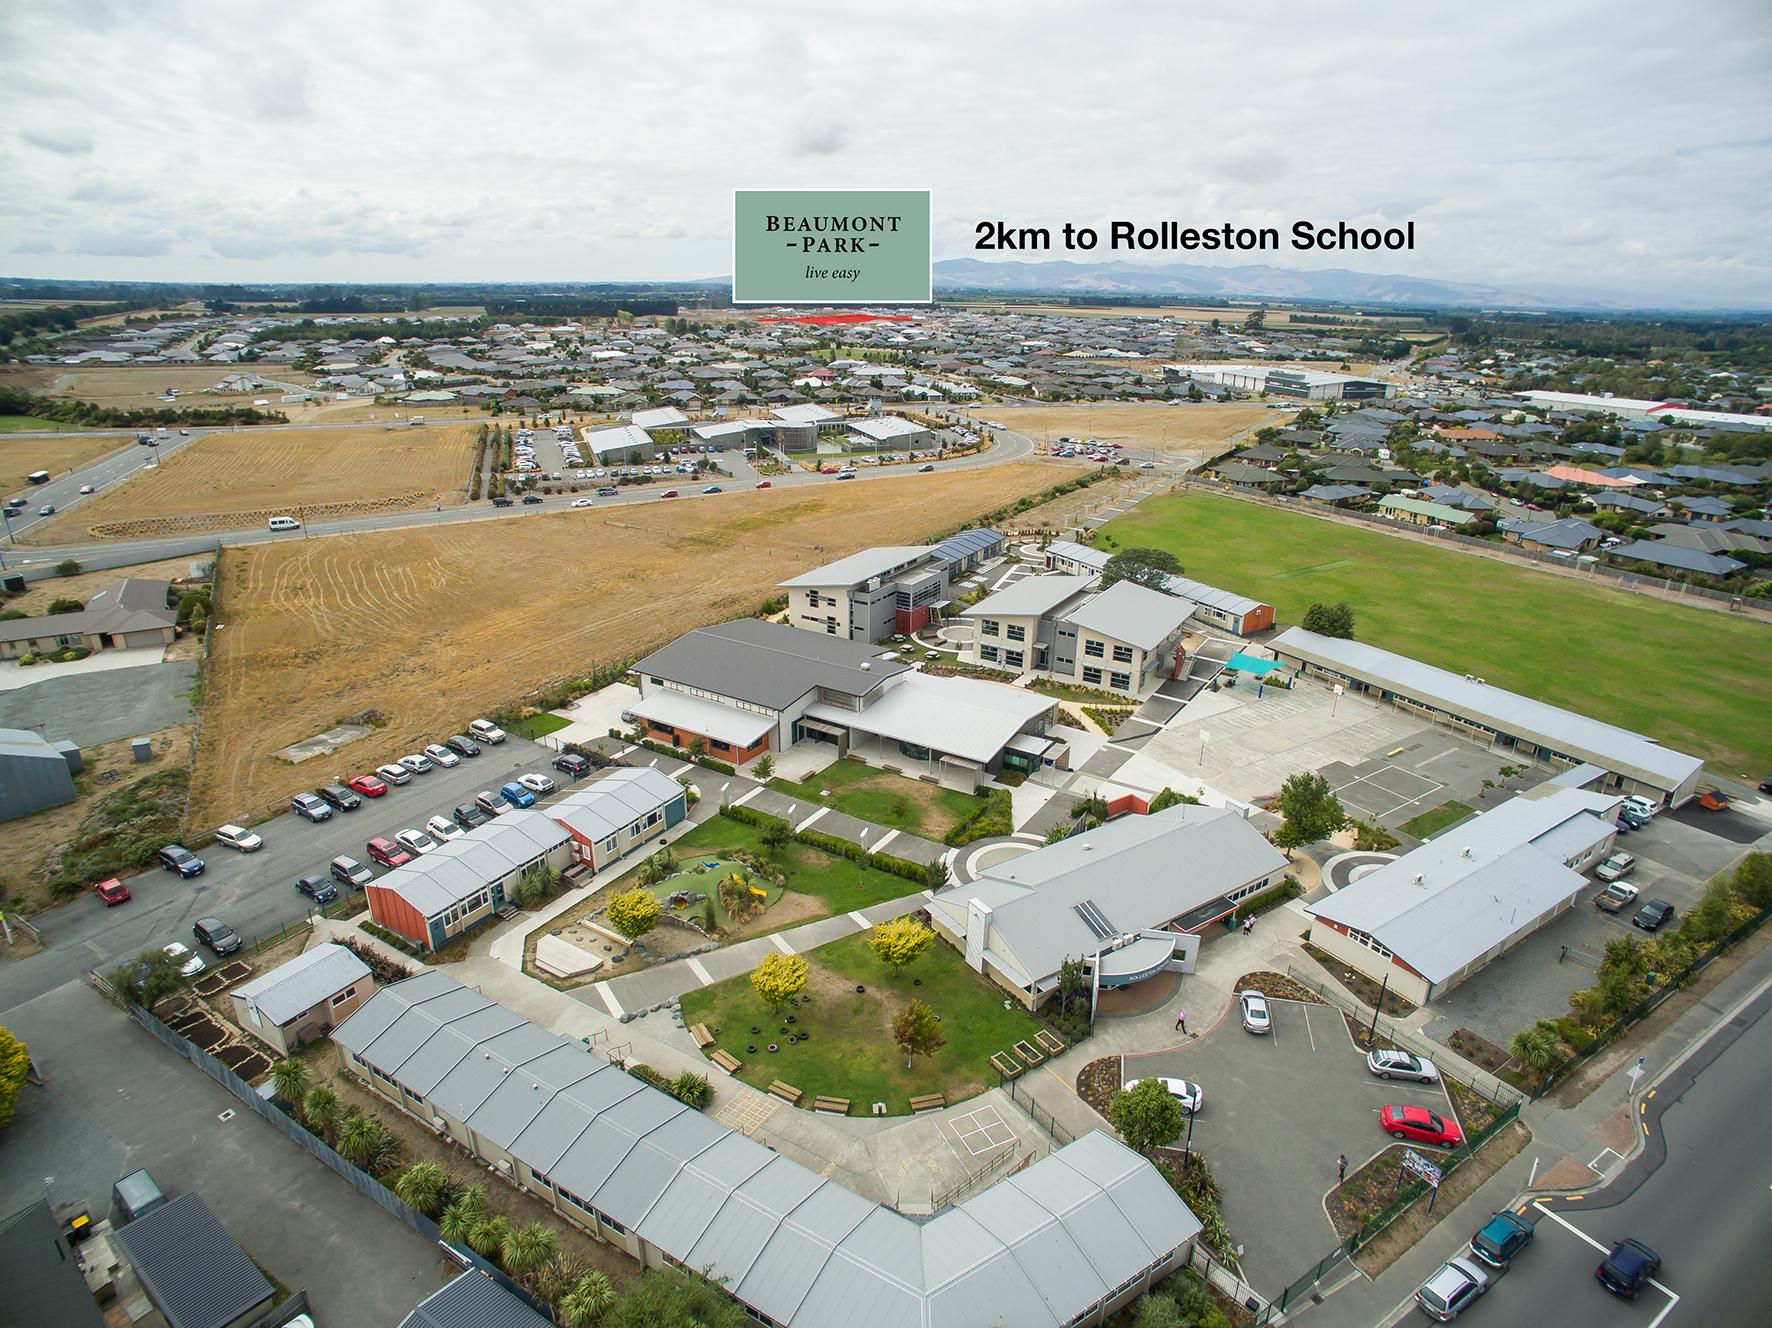 Aerial_Beaumont Park_DJI_0047 v2.jpg